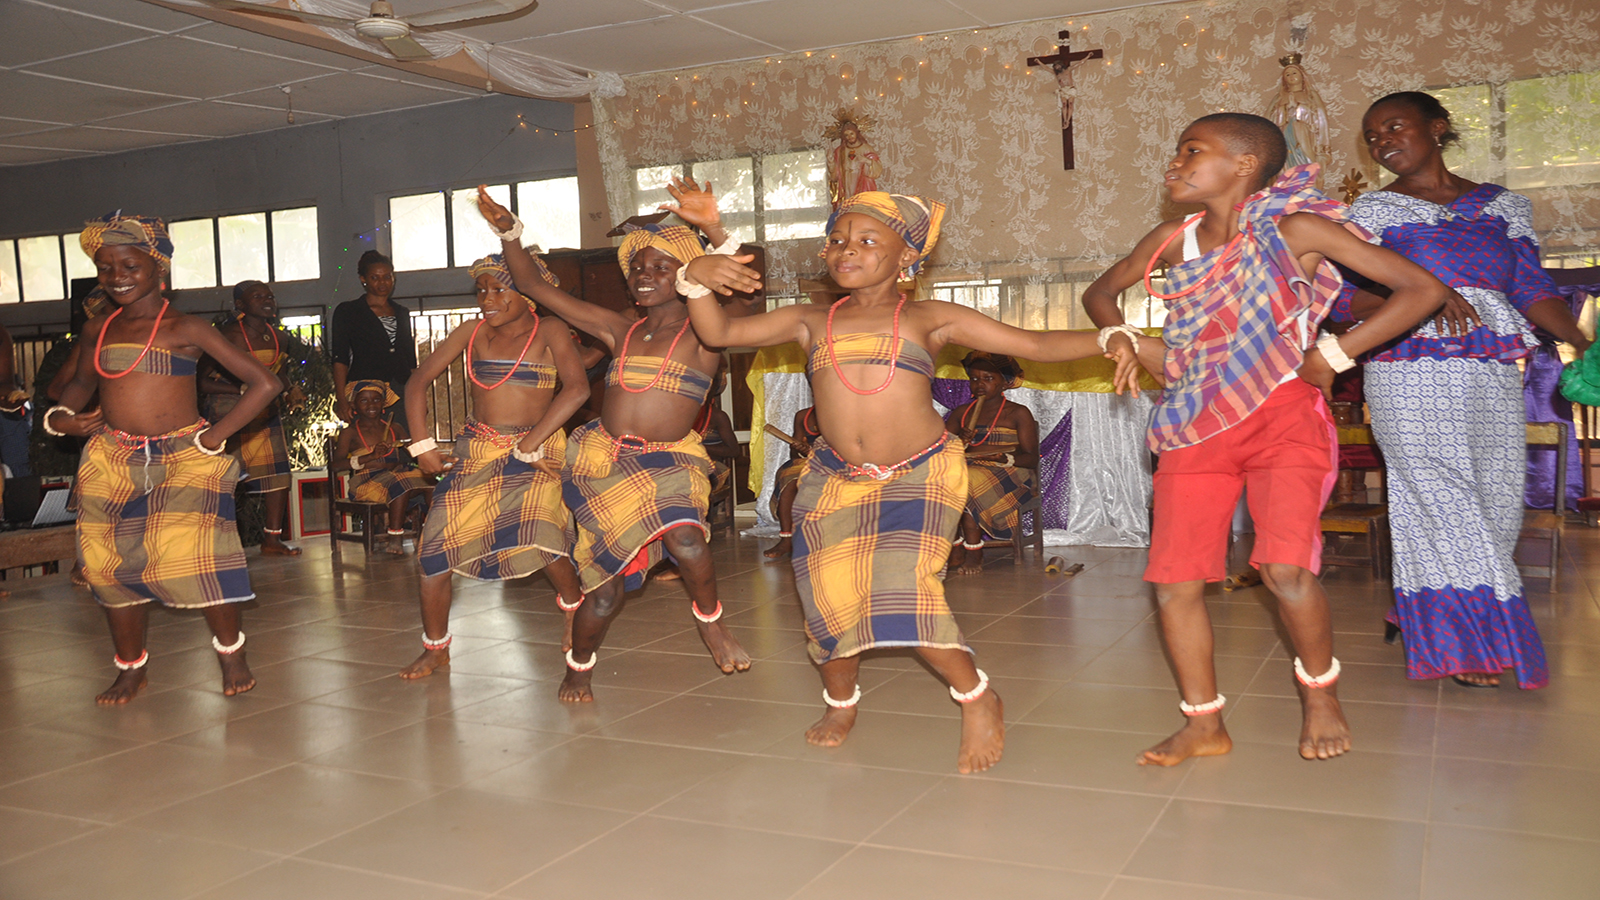 dancing-group